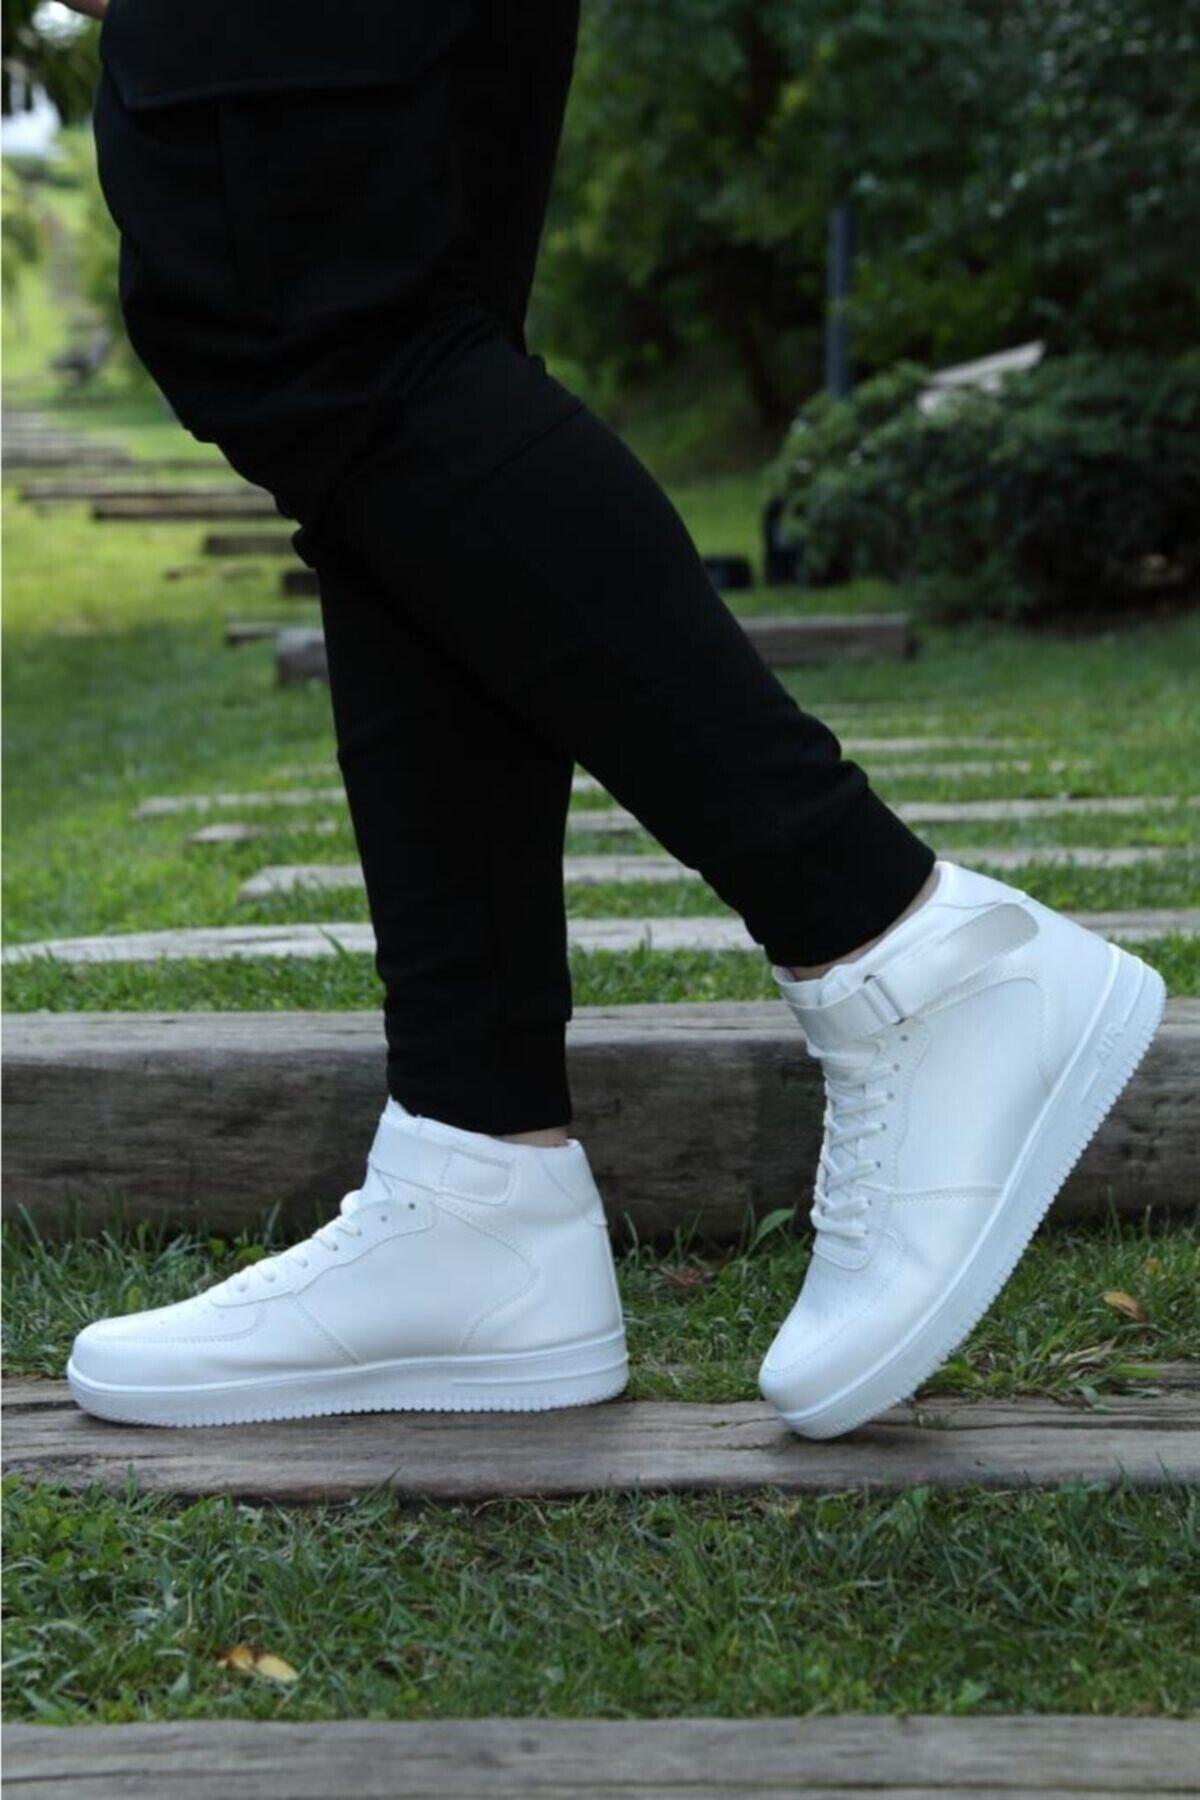 Daxtors Svt55 Air Günlük Ortopedik Unisex Sneaker 2